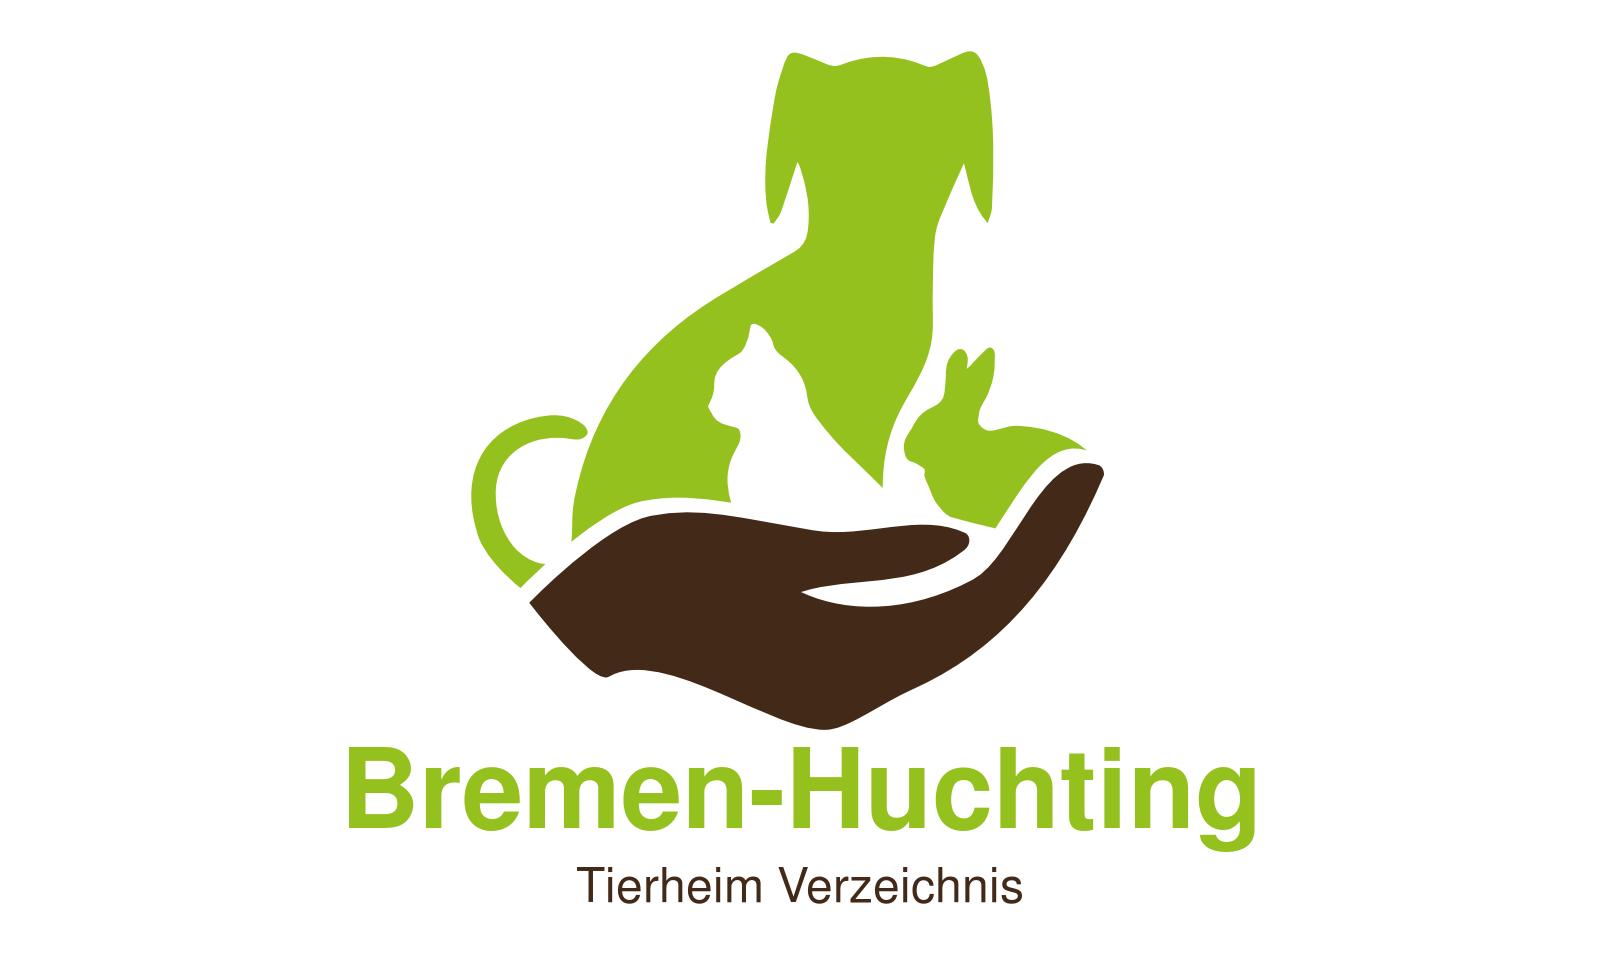 Tierheim Bremen Huchting